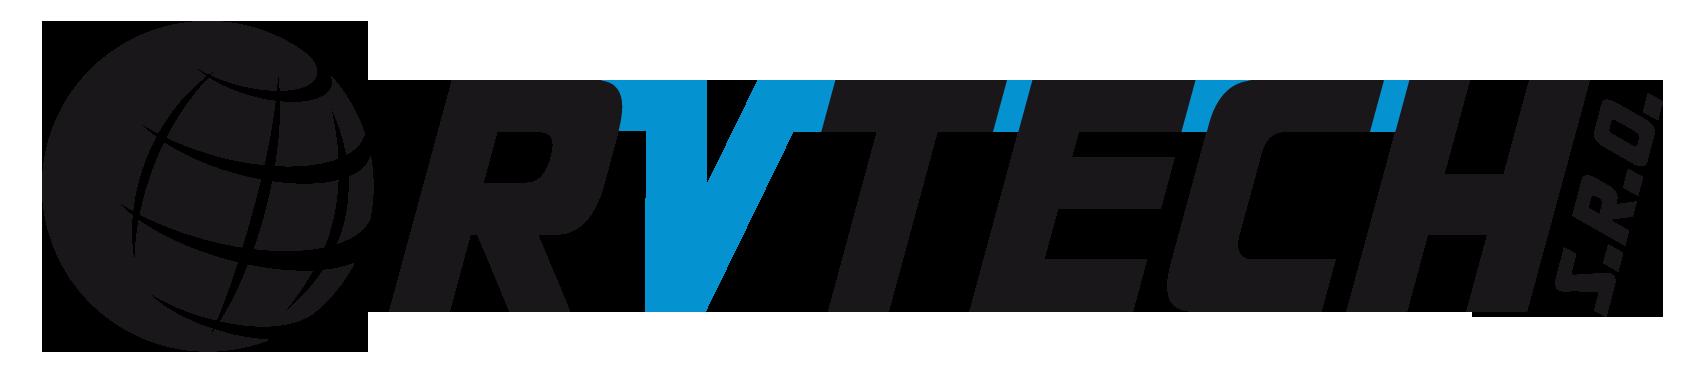 RVTech s.r.o.